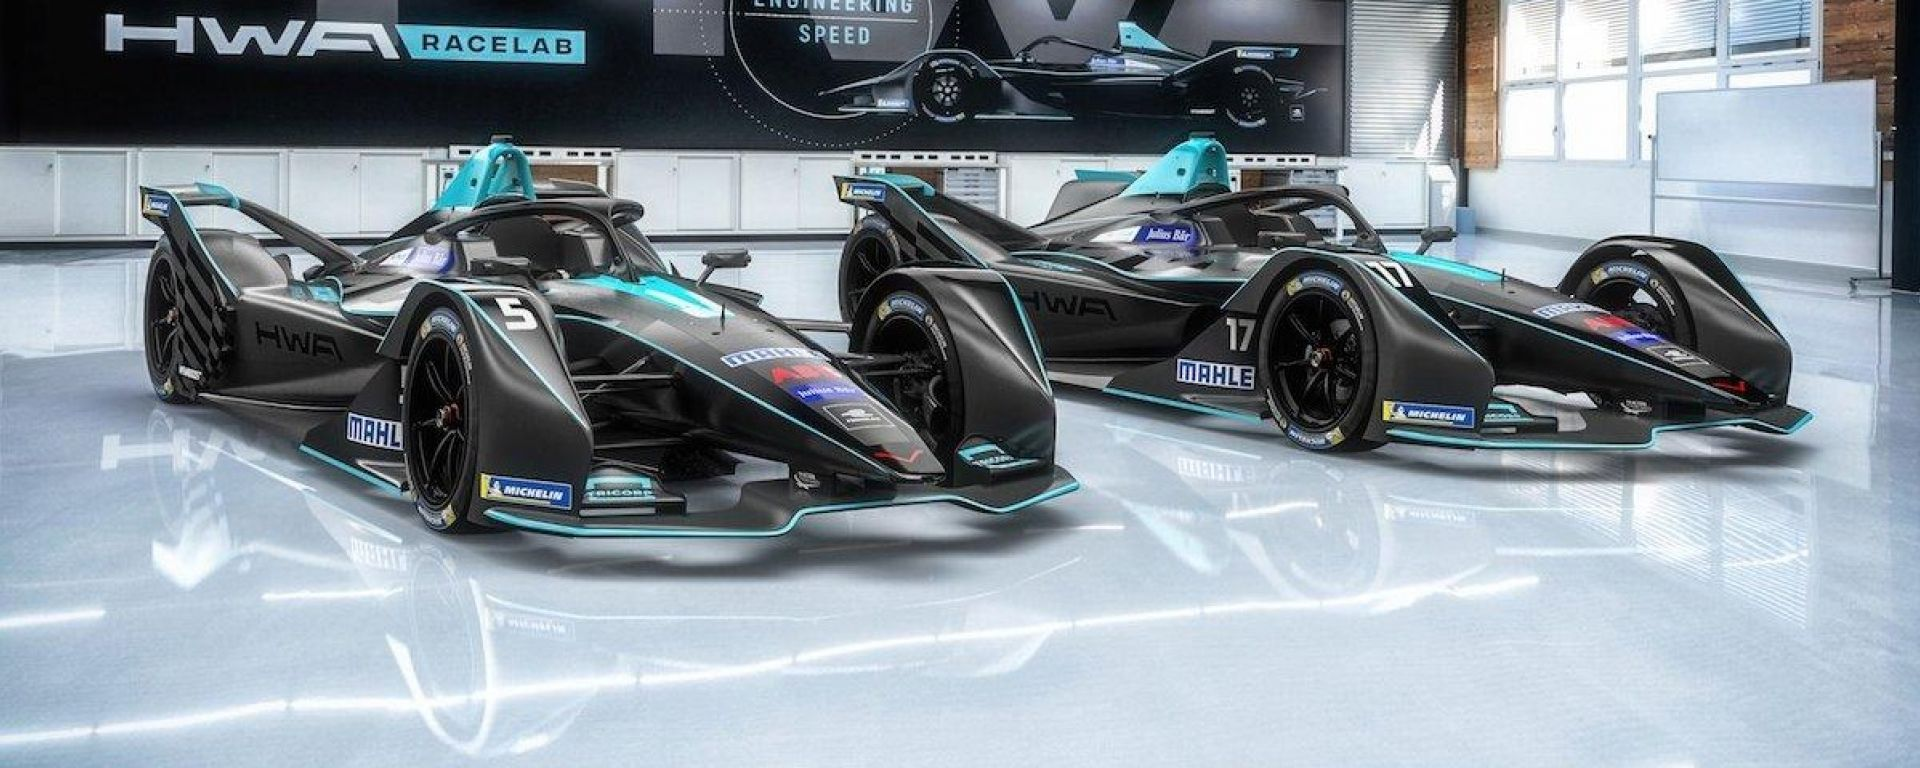 Formula E 2019: HWA Racelab Team